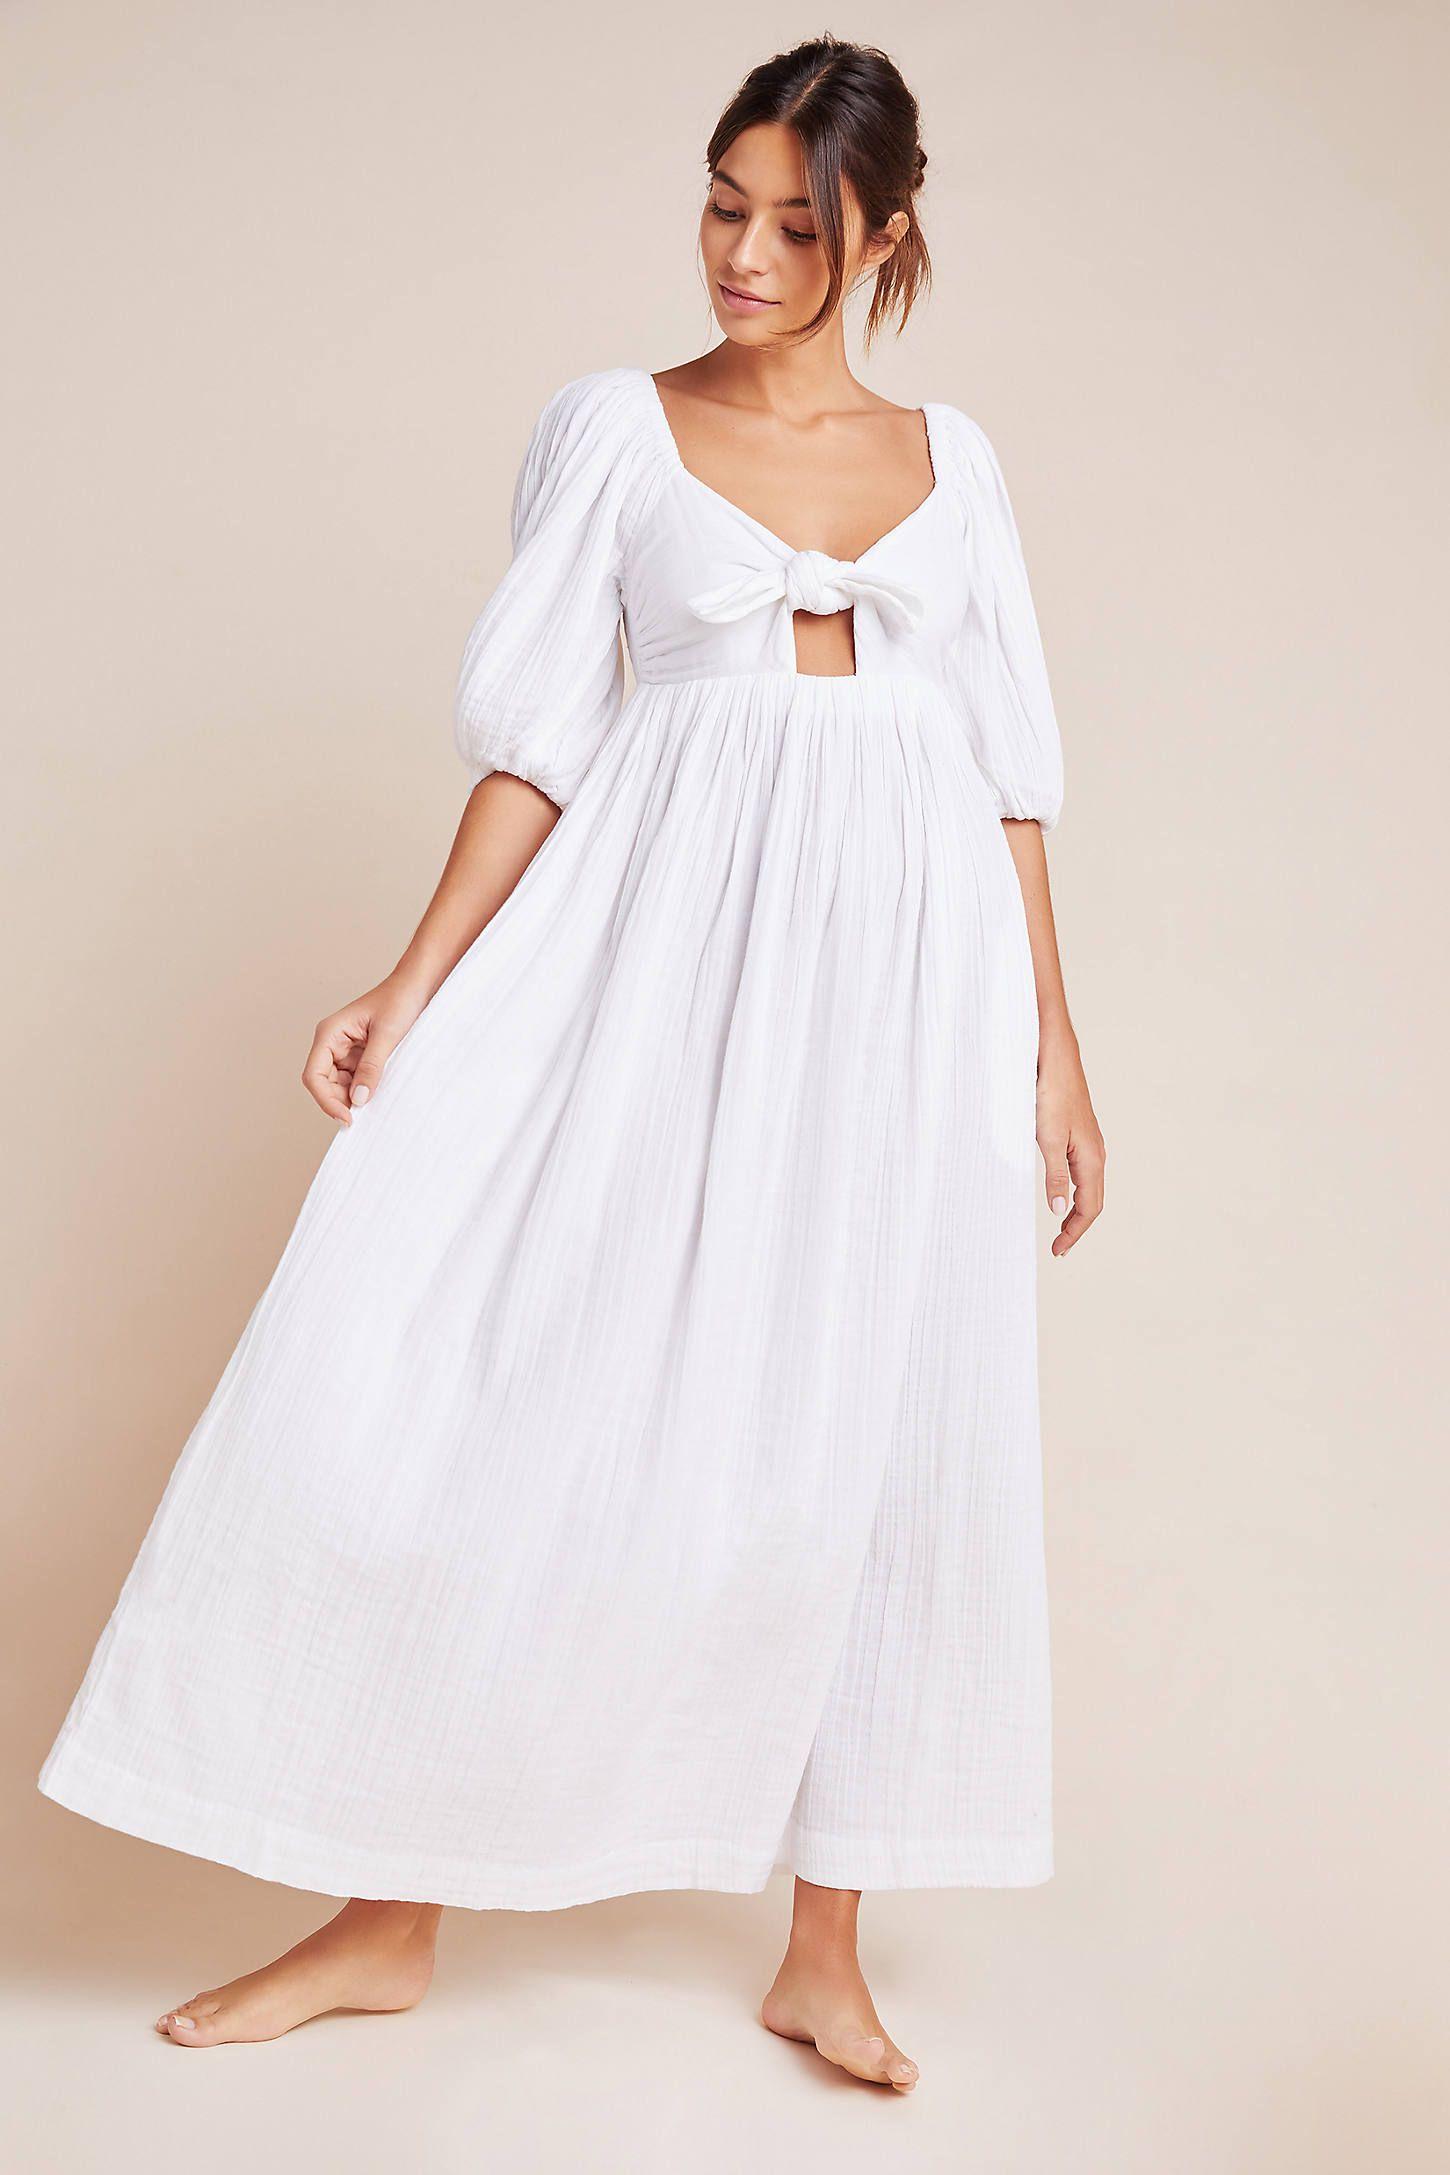 Mara Hoffman Violet Crinkled Organic Cotton Gauze Maxi Dress In White Modesens Gauze Maxi Dress Maxi Dress Dresses [ 2175 x 1450 Pixel ]